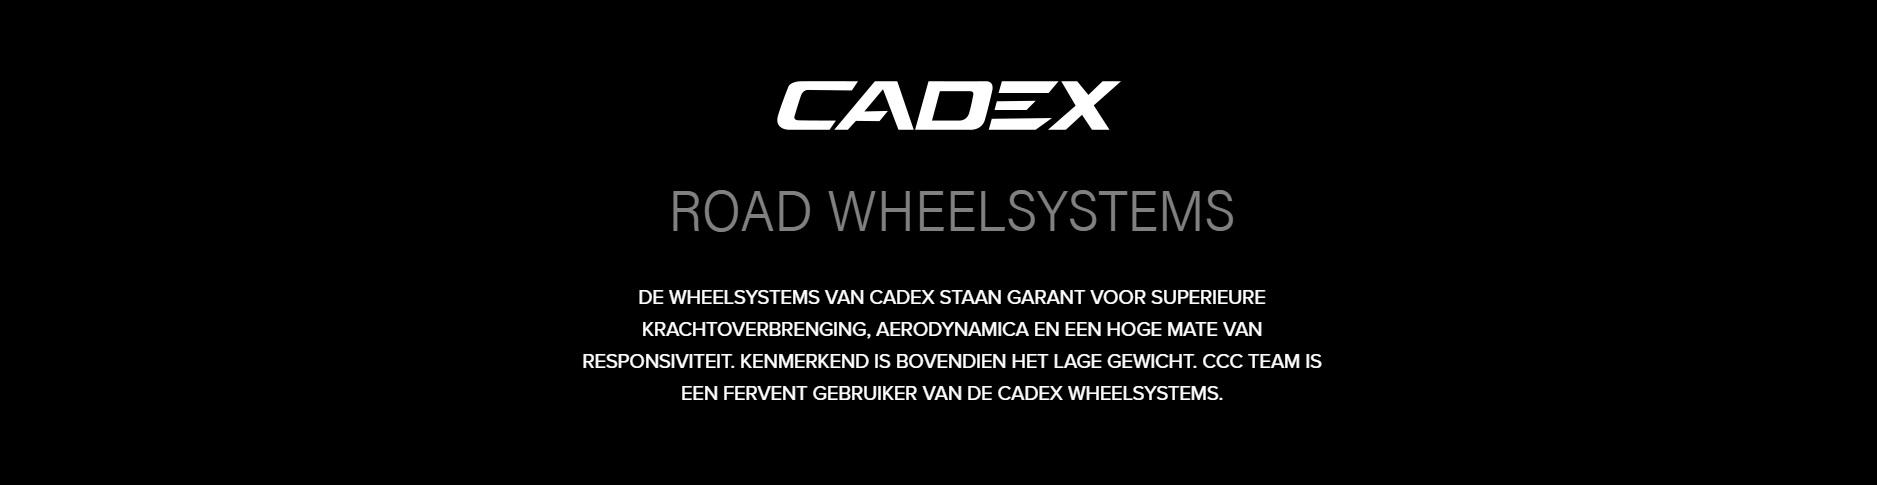 Cadex Roadwheelsystems